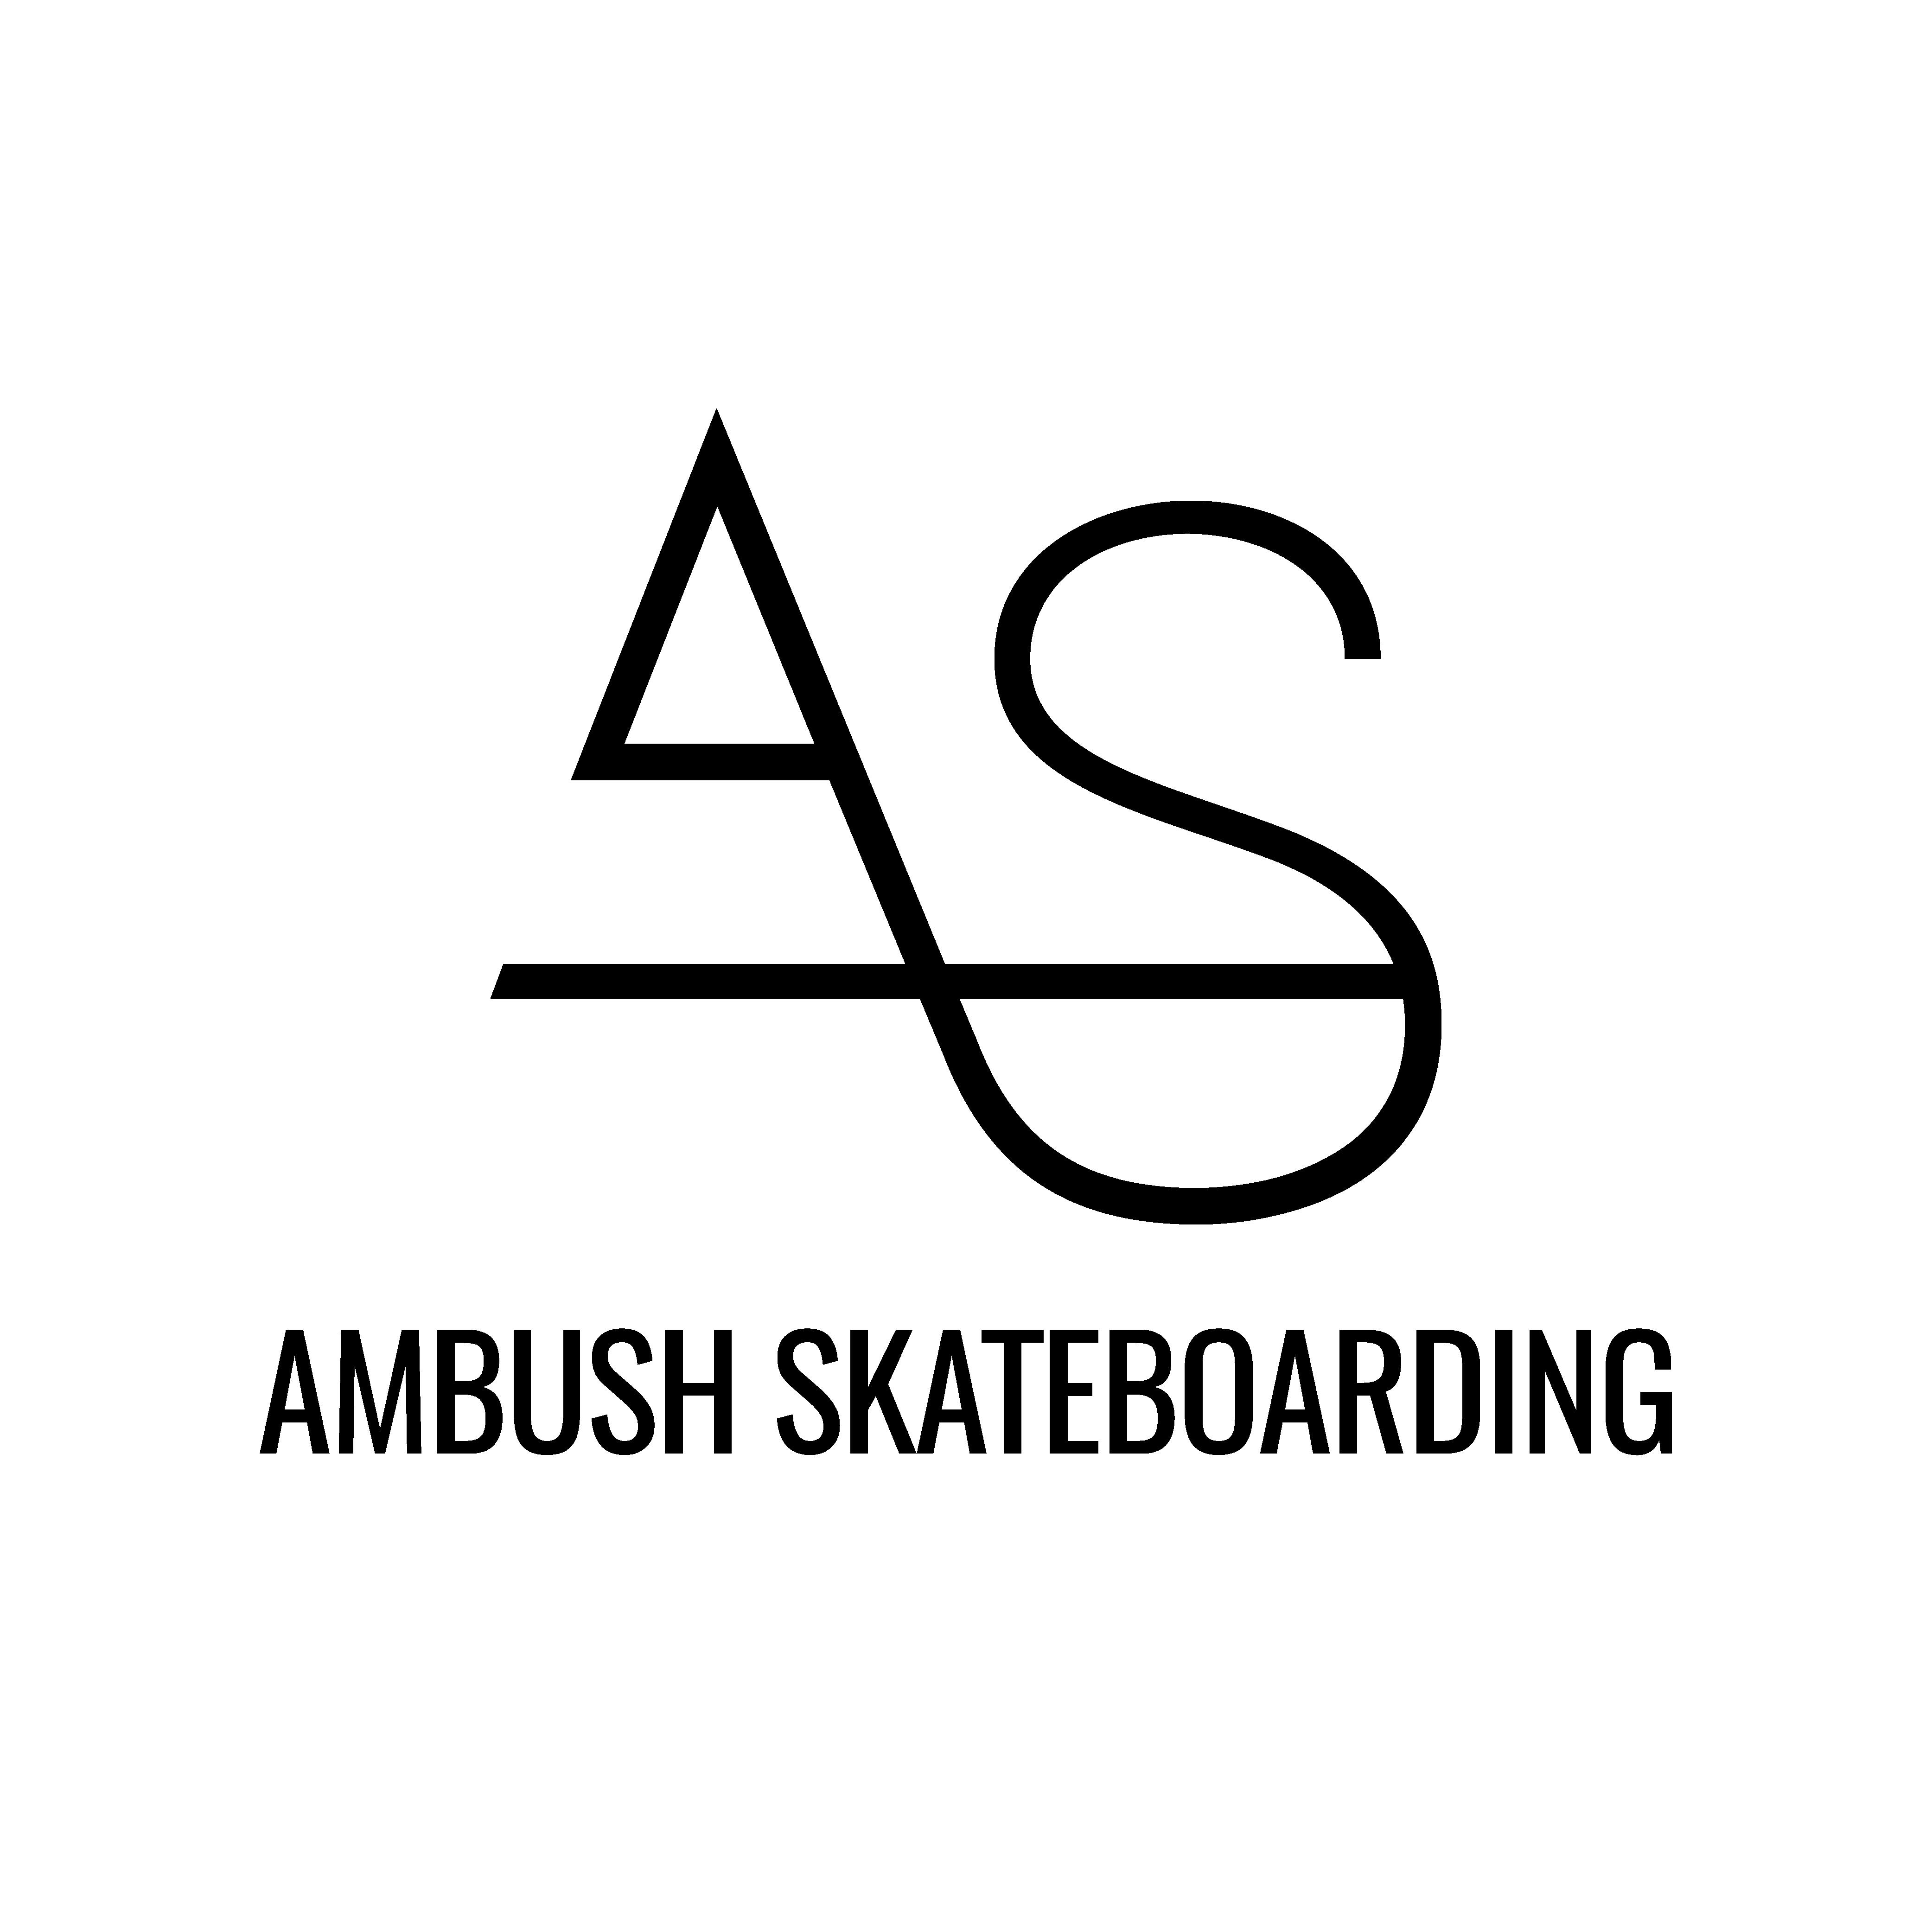 Ambush Skateboarding Logo (Store Sign/Website Logos)